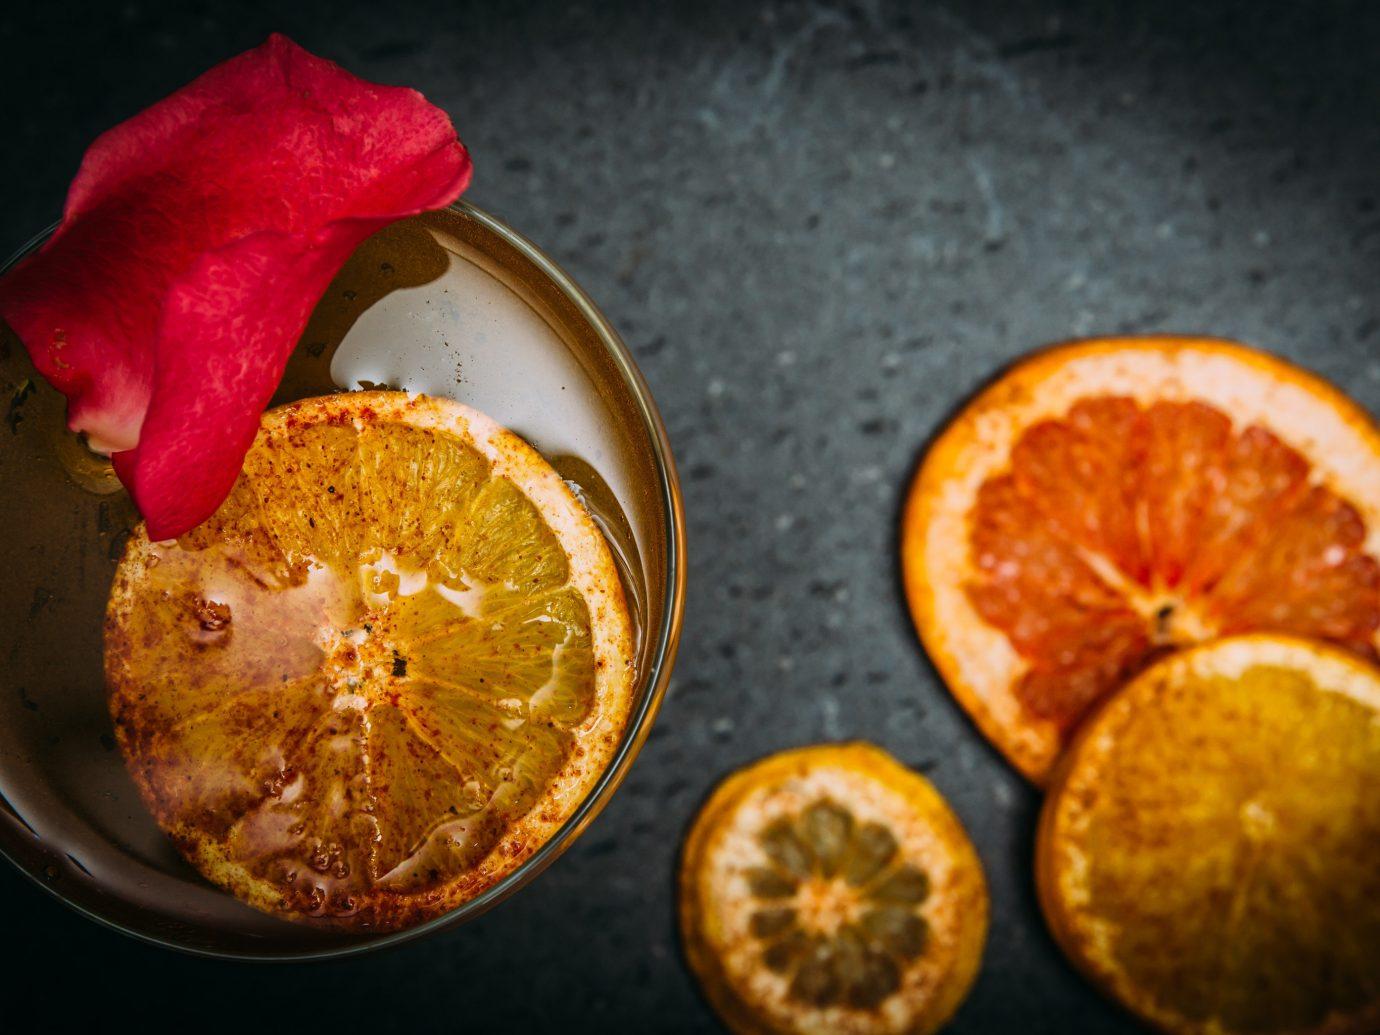 Trip Ideas food plant produce fruit land plant orange citrus flowering plant Drink sliced half